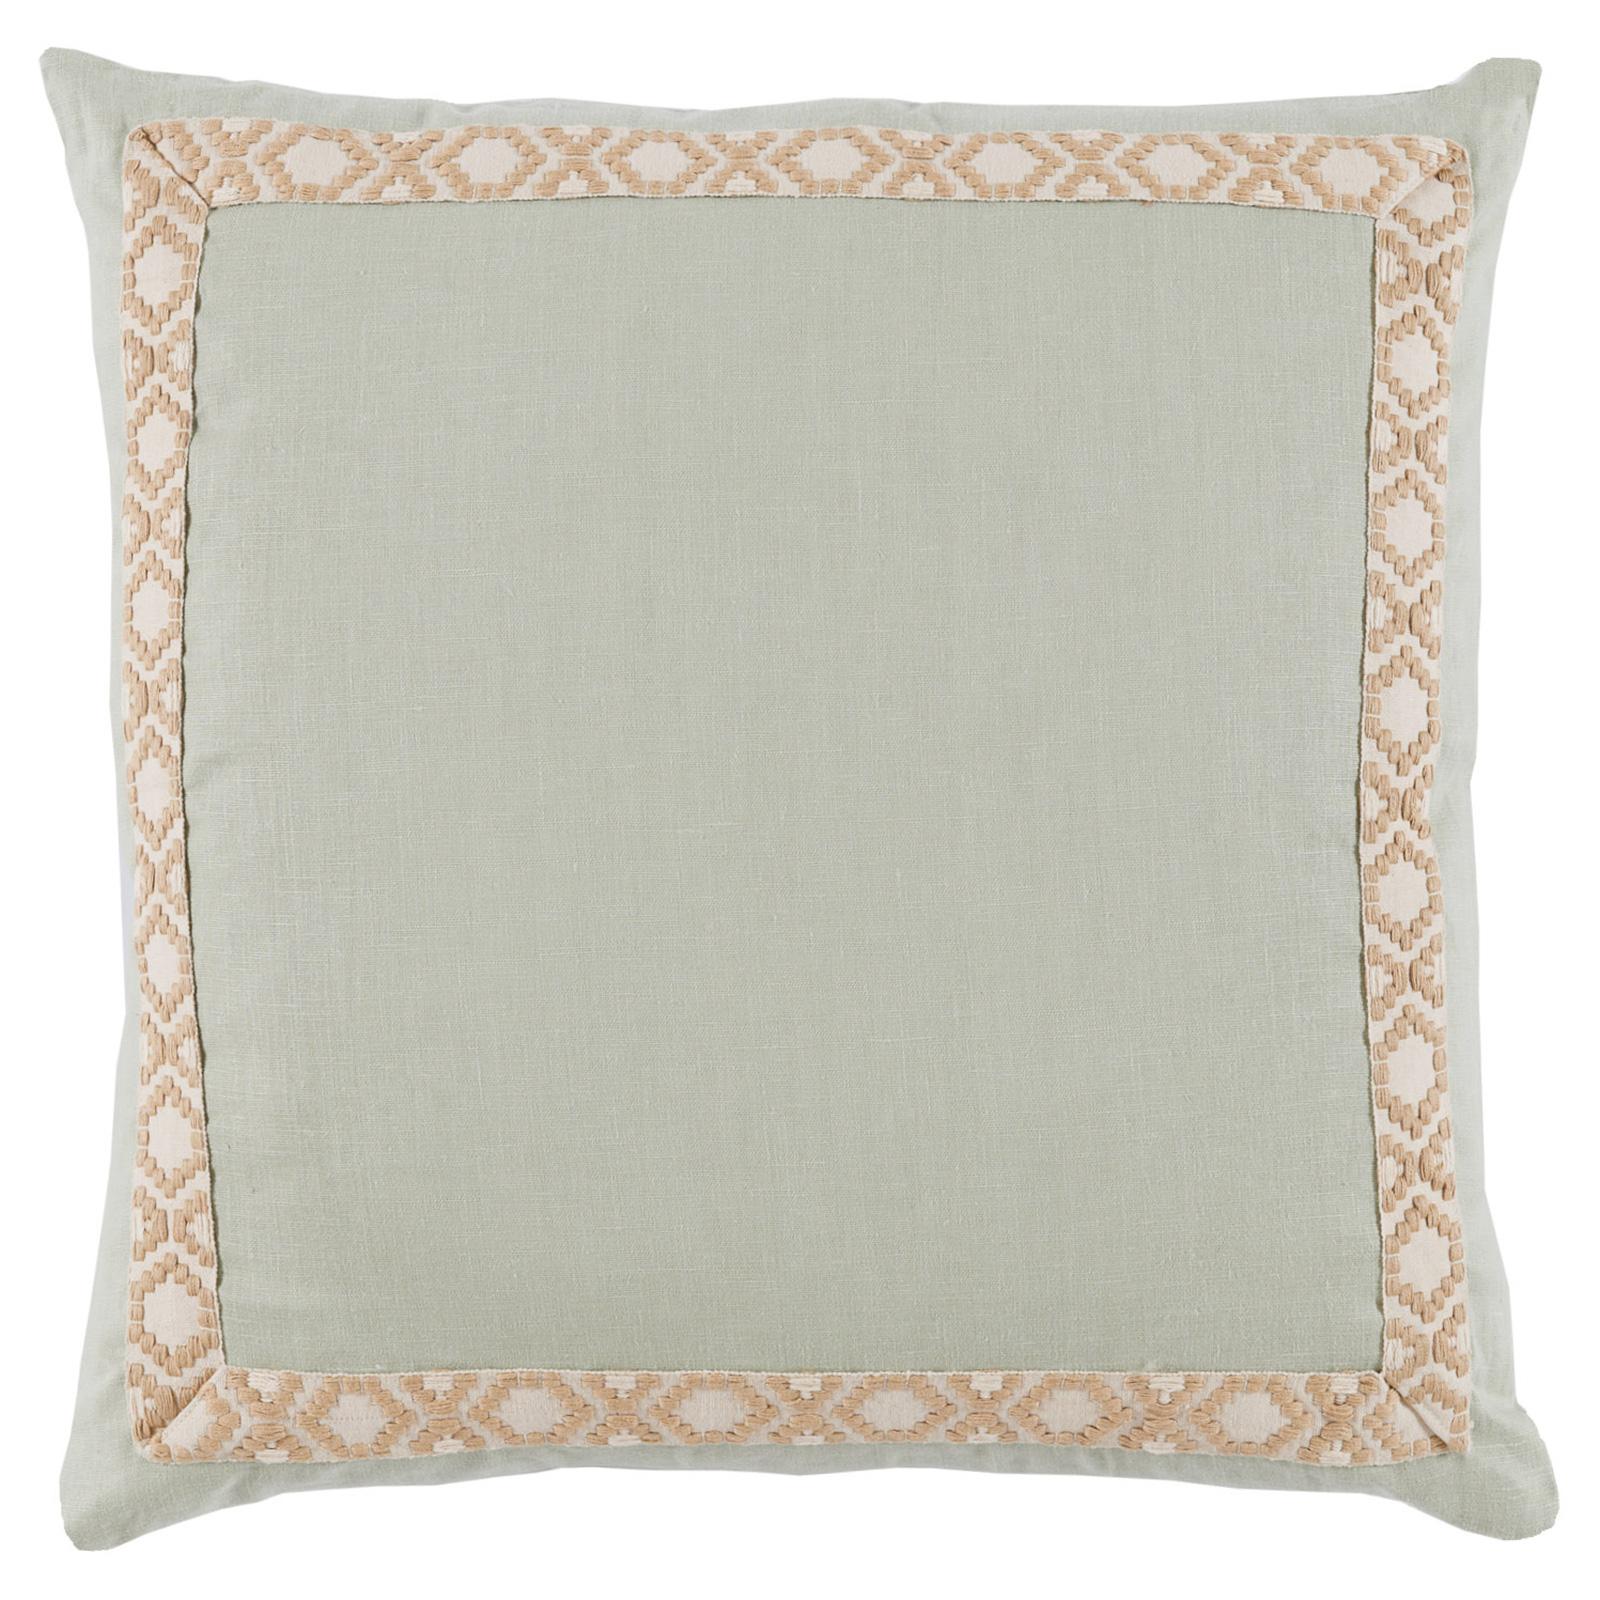 Kaia Global Sea Green Linen Trim Band Pillow - 24x24